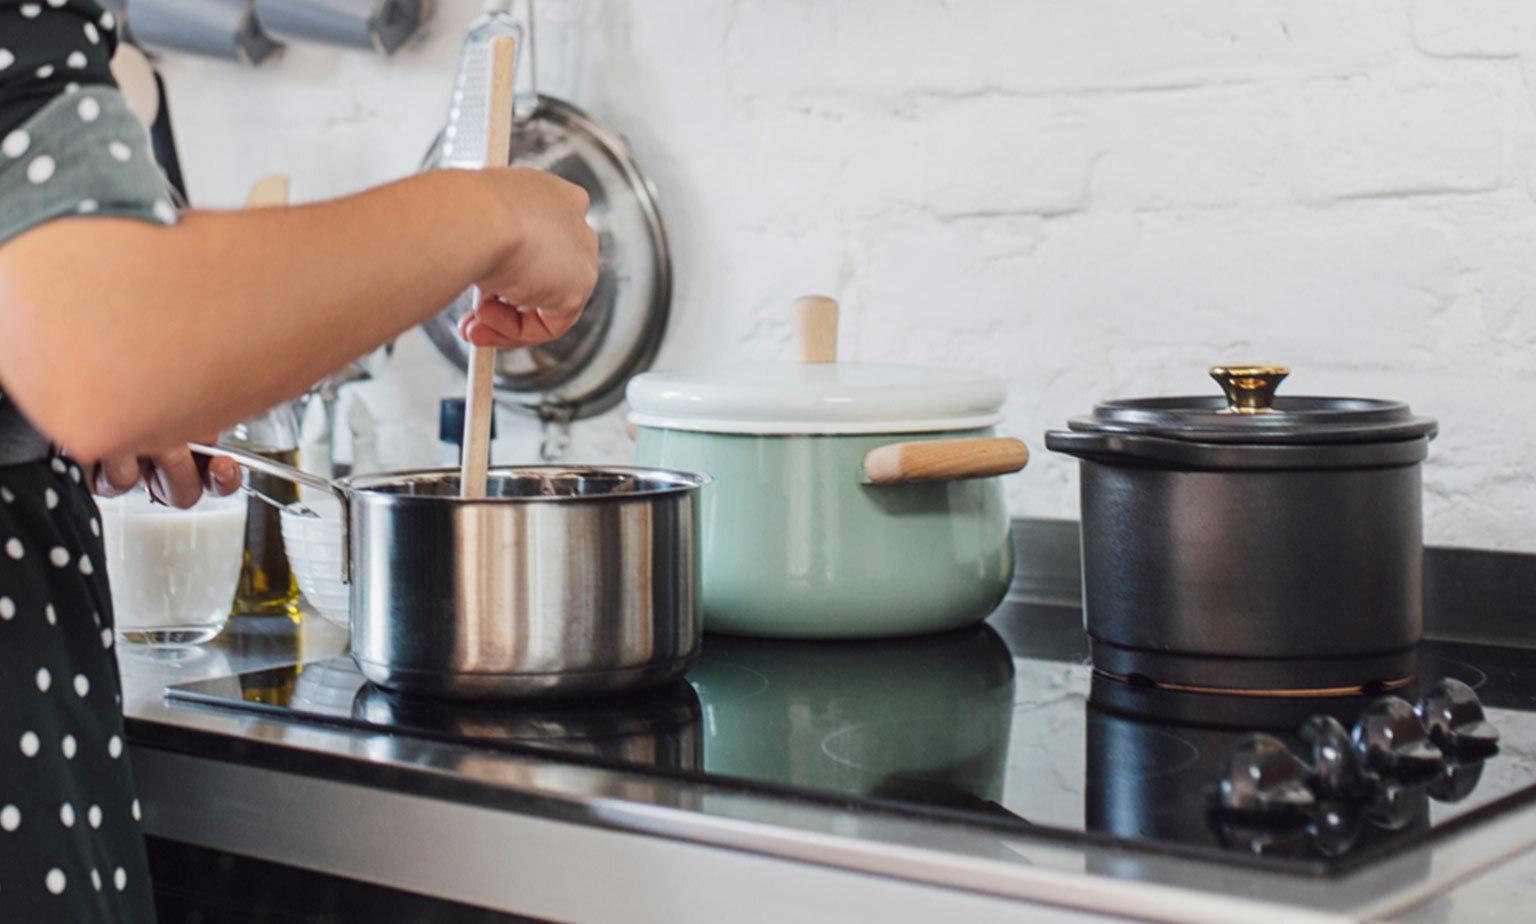 Koch- & Essgeschirr gebraucht